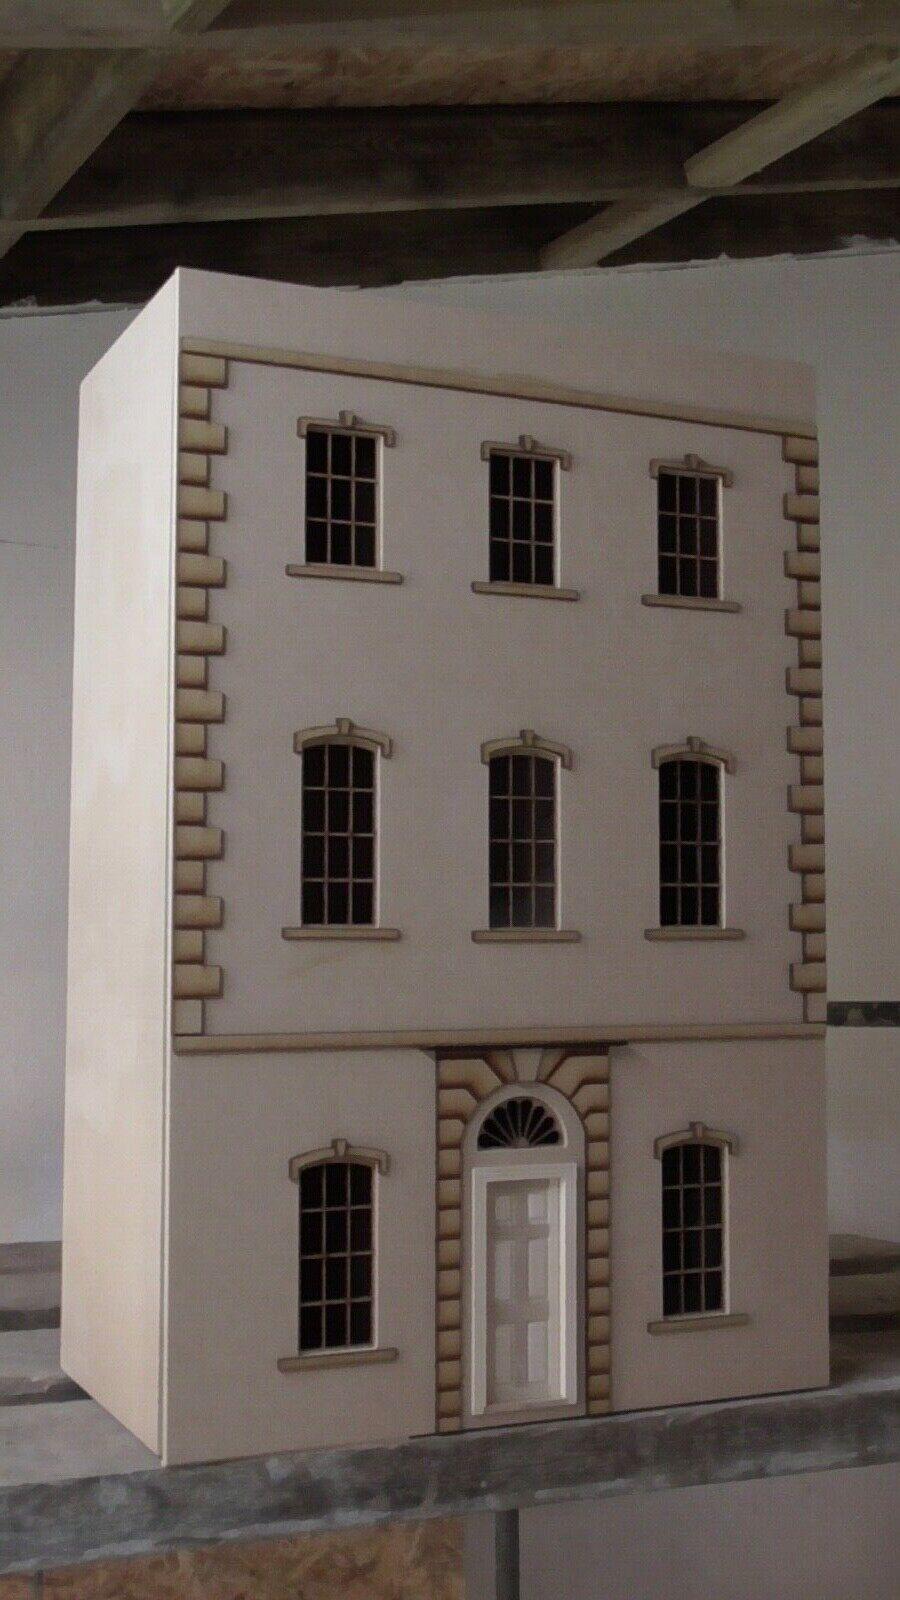 Escala 1 12 Casa De Muñecas Devizes House 6 habitaciones Kit por Dhd